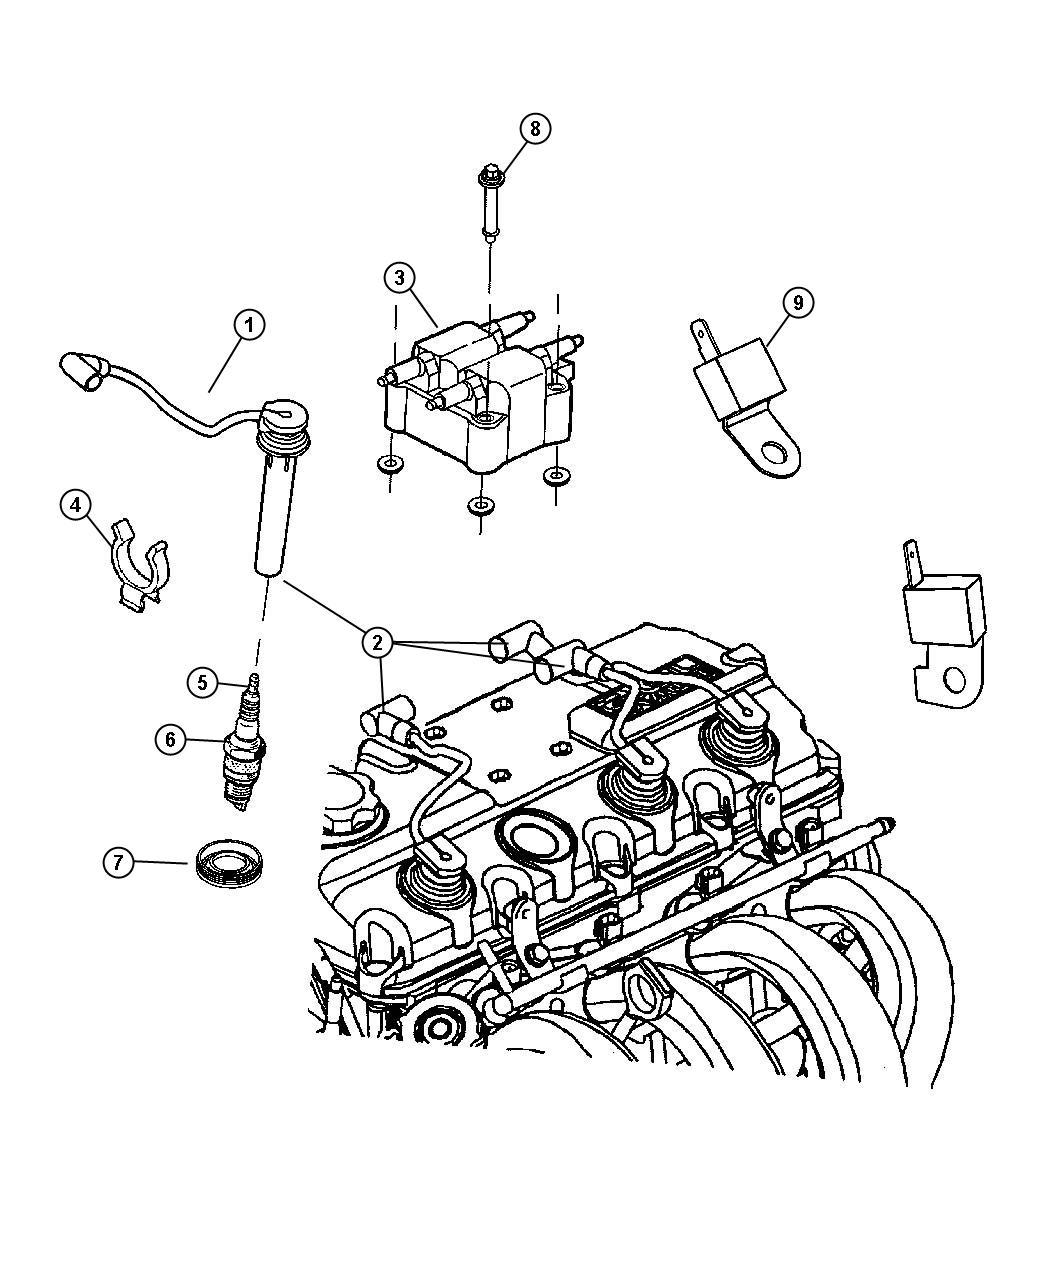 2008 Chrysler PT Cruiser Spark plug. Up to 11/27/03. Plugs